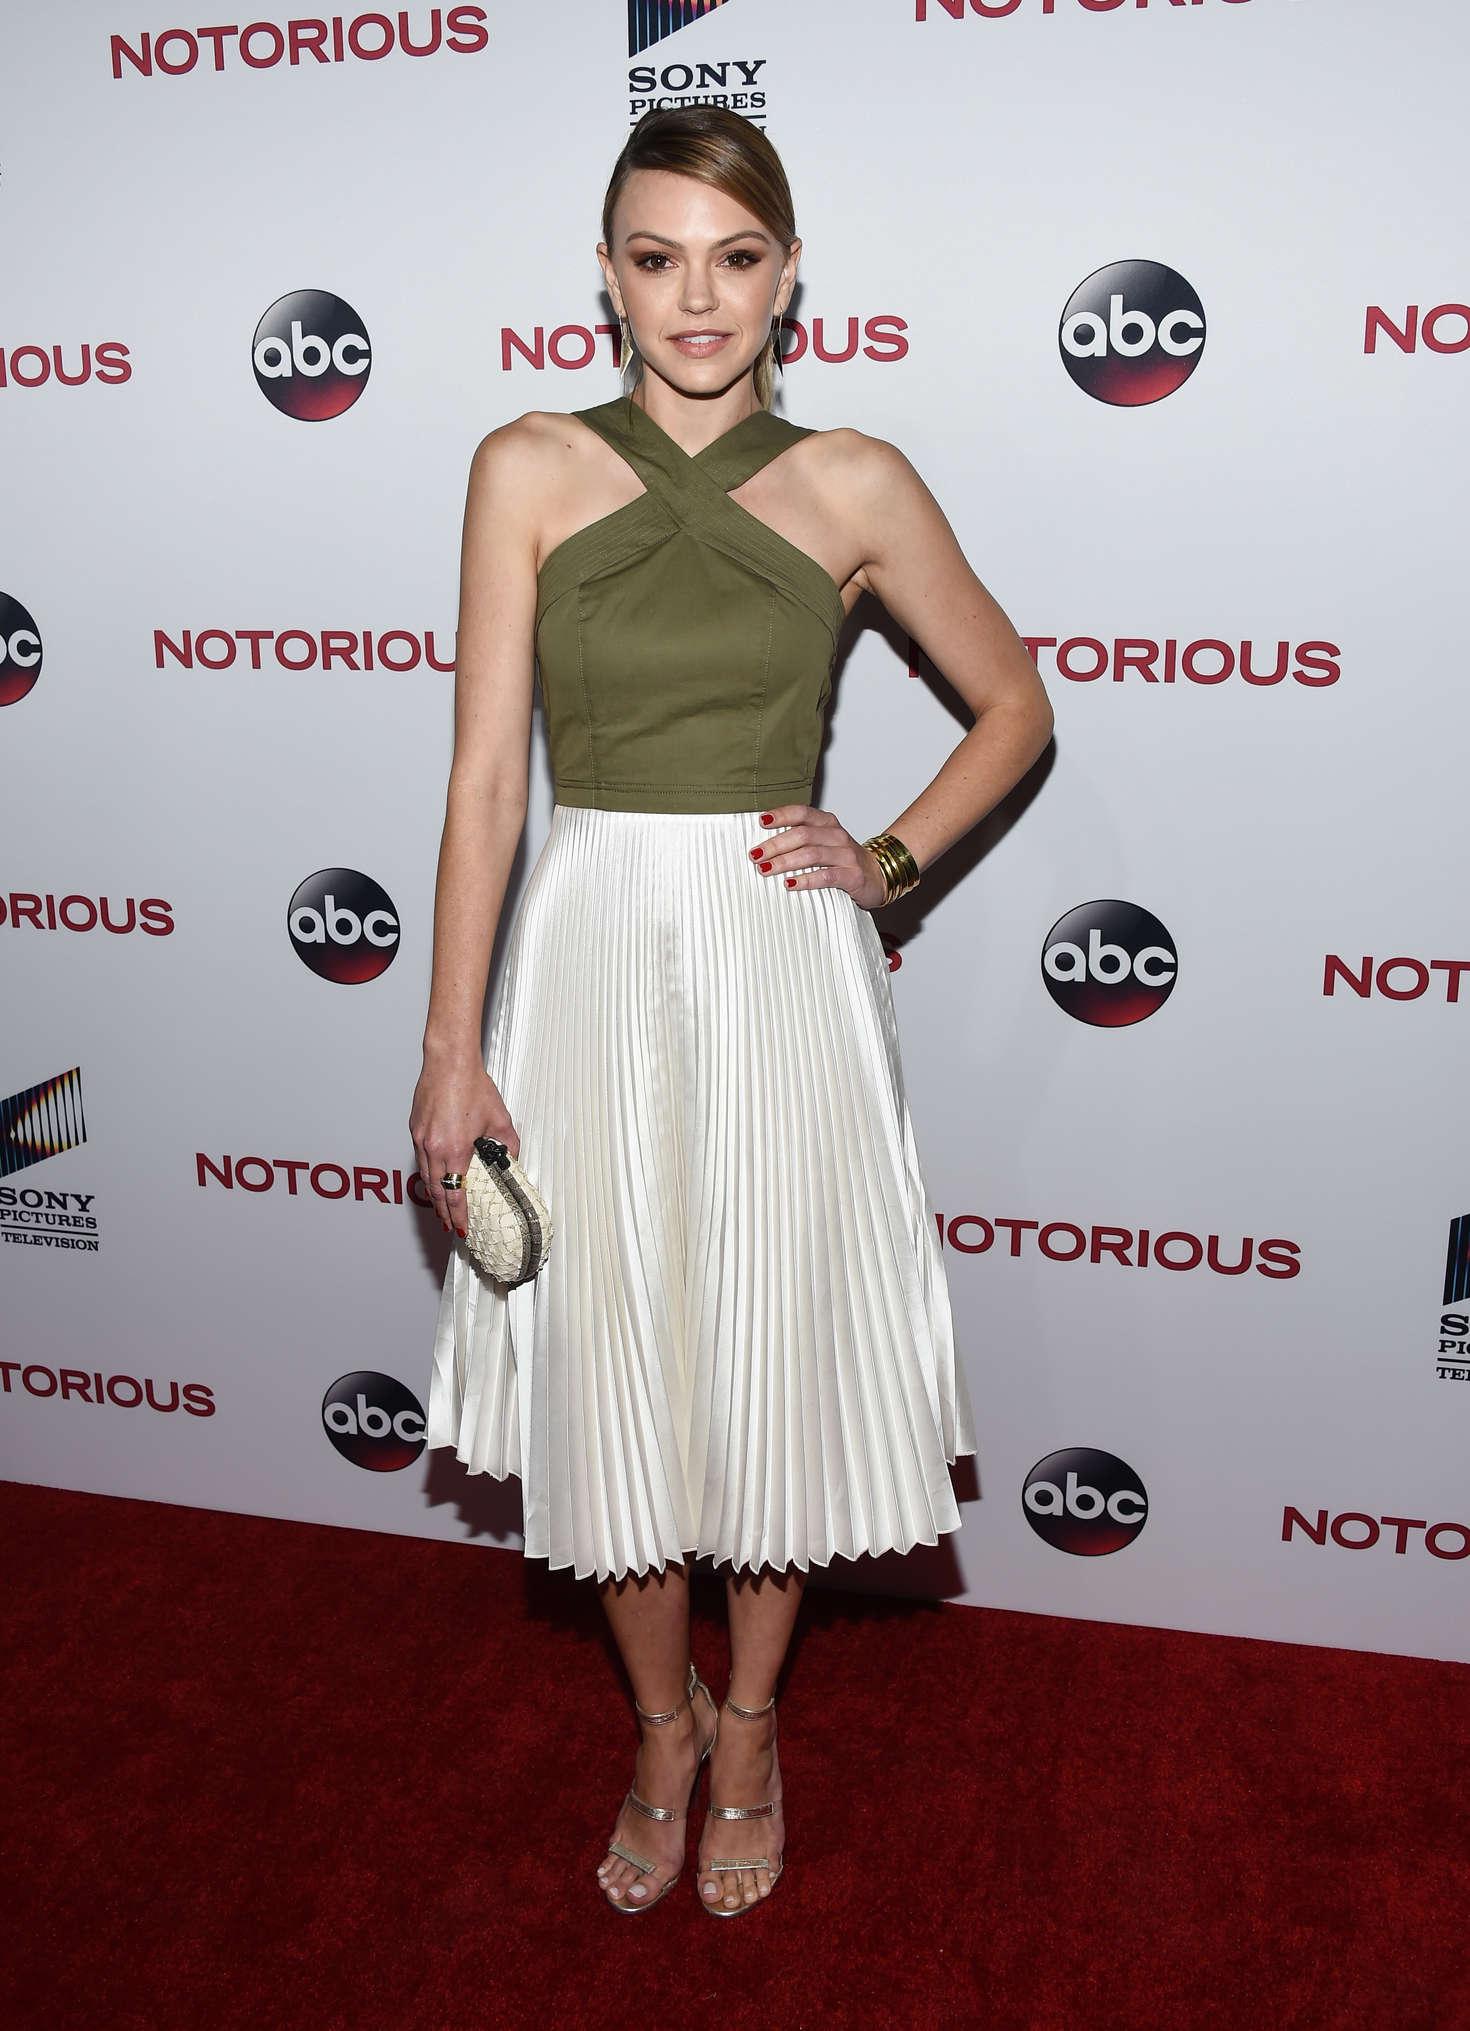 Aimee Teegarden 2016 : Aimee Teegarden: Notorious LA Premiere -23